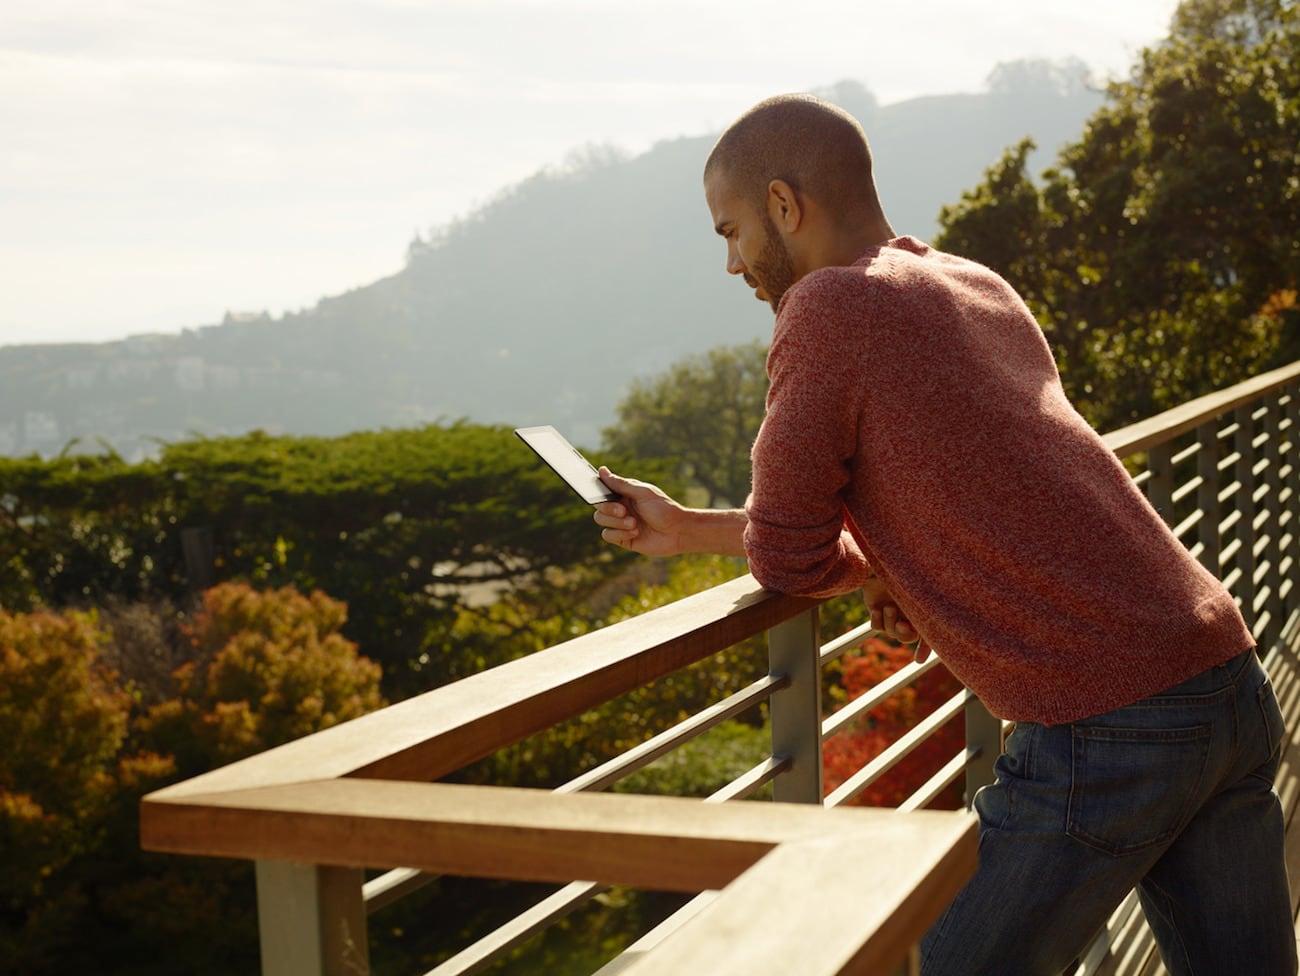 Kindle Oasis Waterproof e-Reader